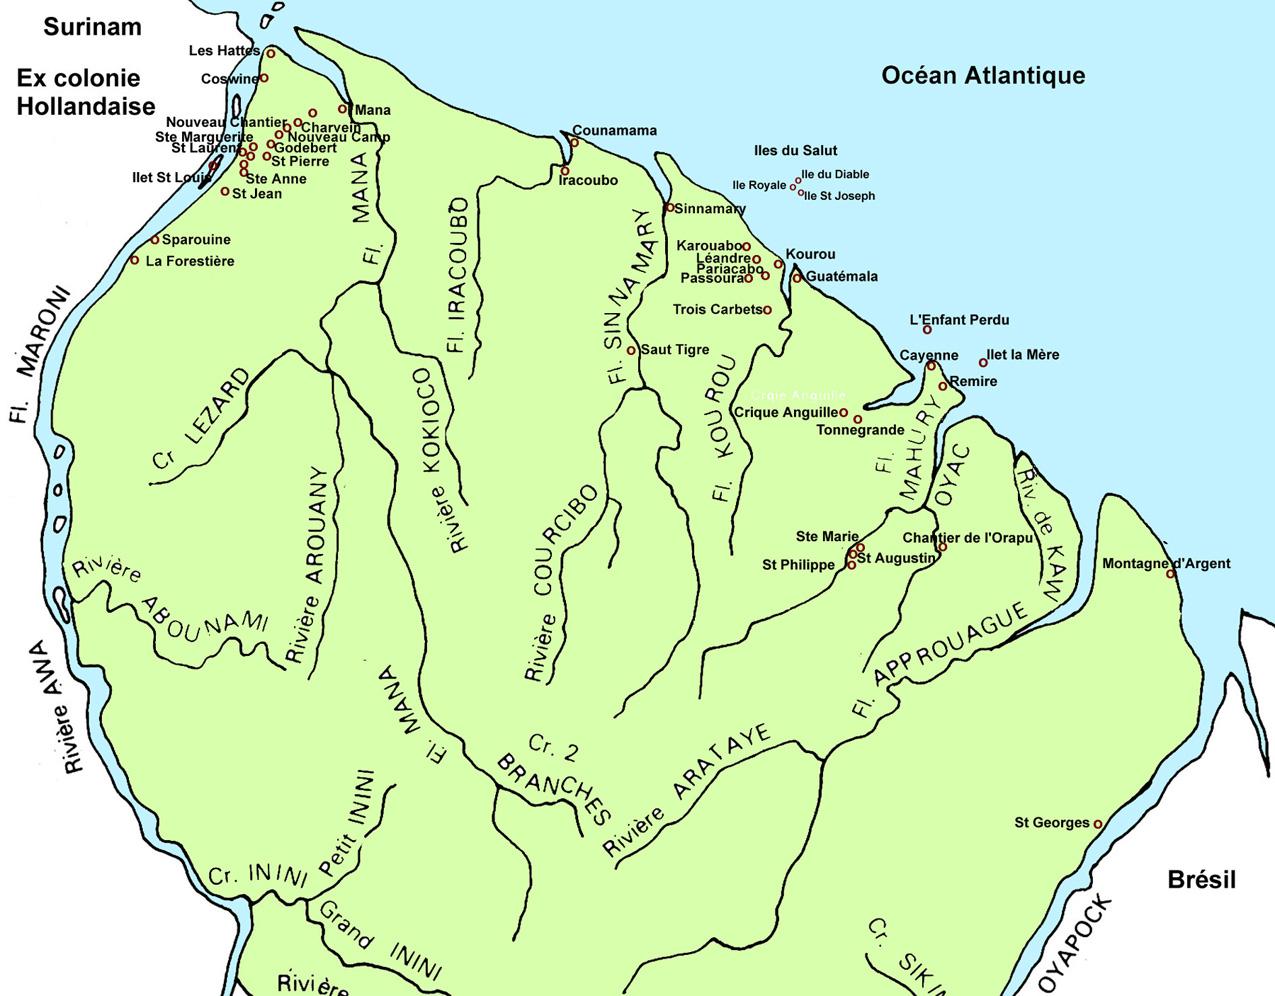 http://genealogie.dalbiez.eu/images/Guyane/Carte_de_Guyane.jpg